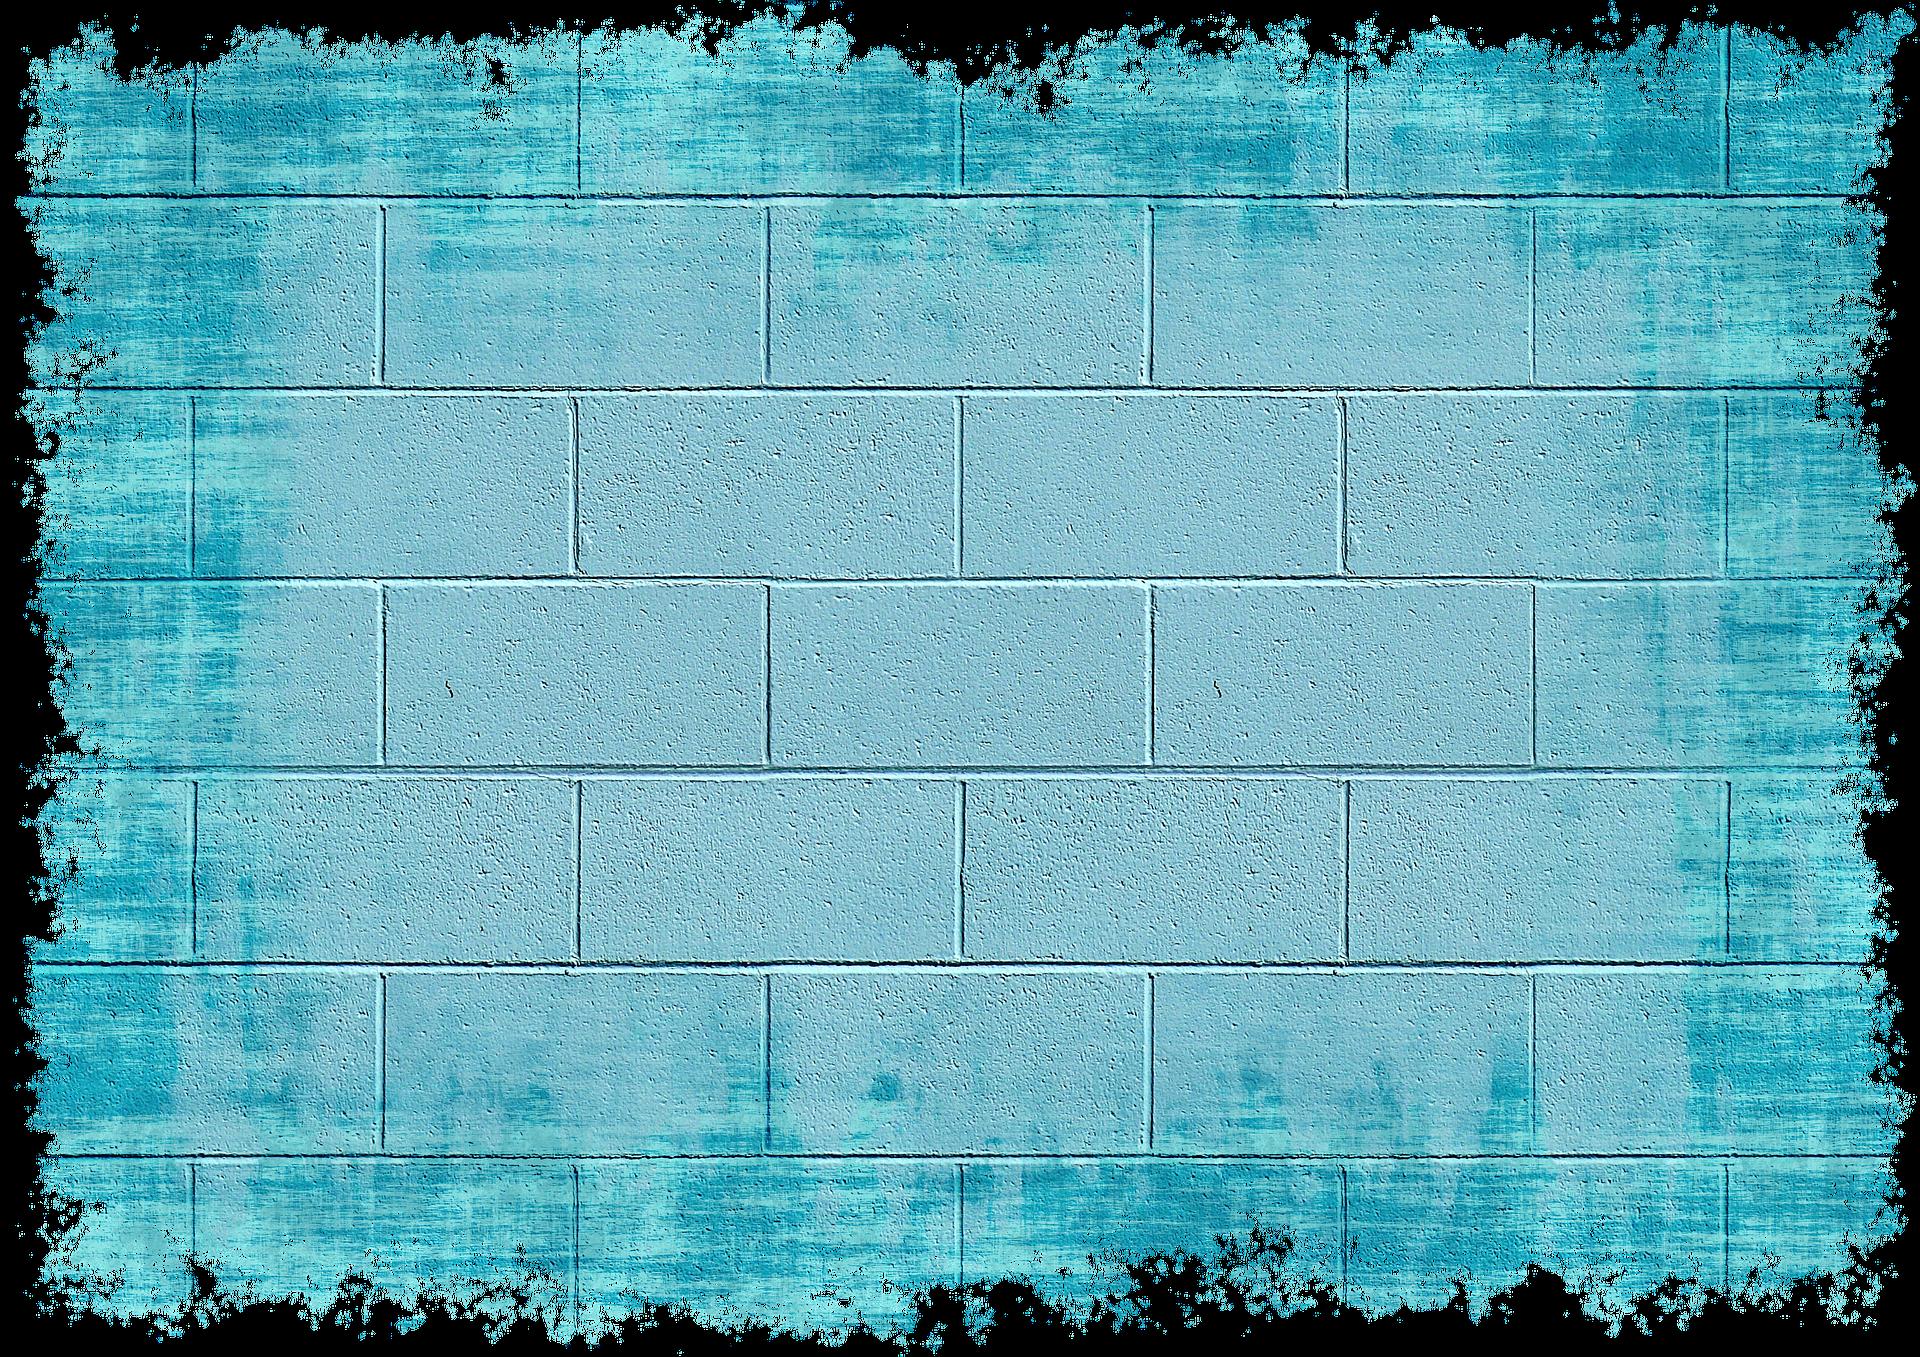 Stone bricks photos textures. Graffiti clipart brick wall